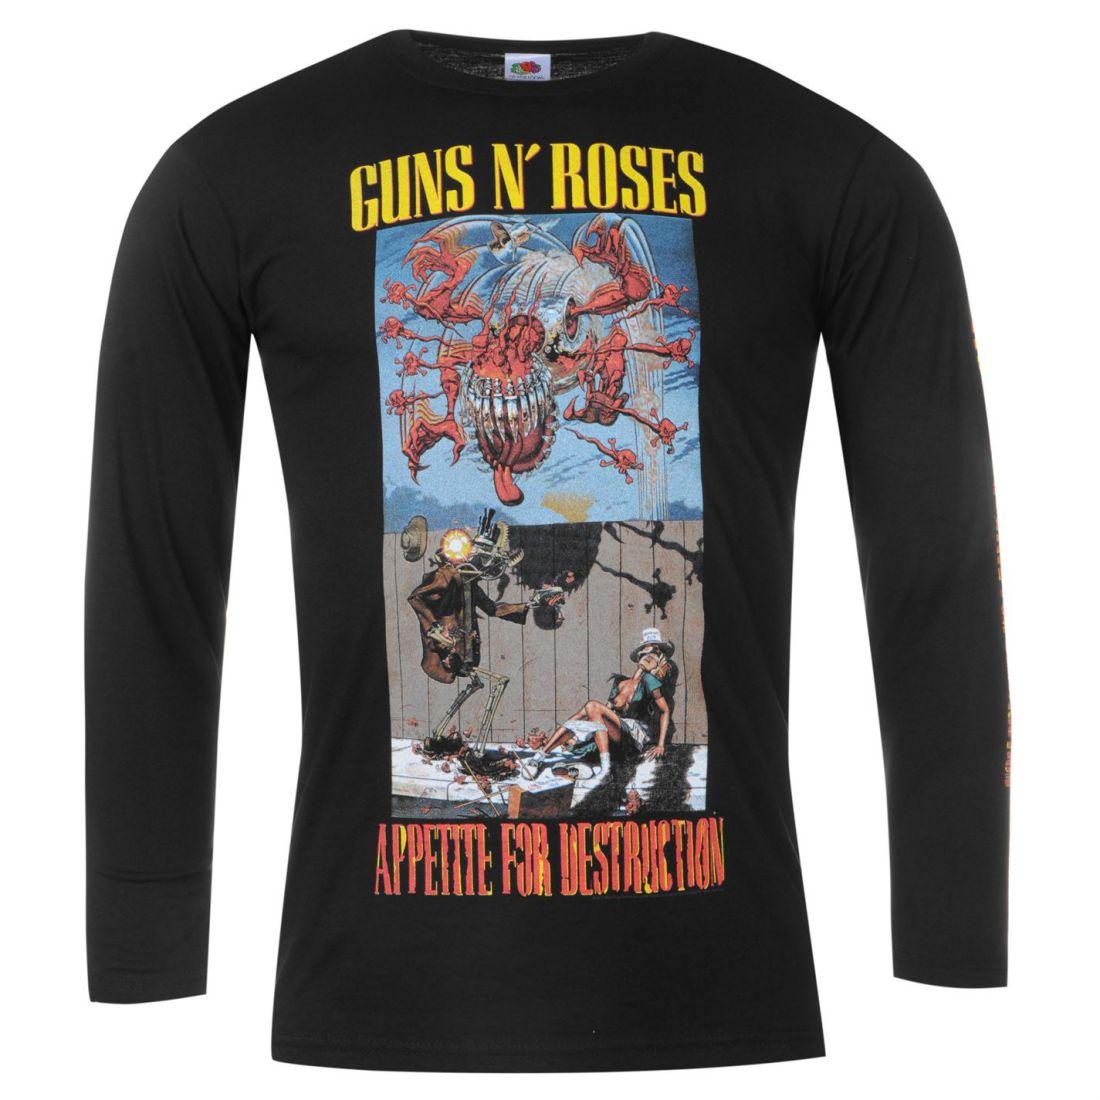 Guns N Roses Shirts : official guns n roses full length sleeve t shirt mens gents tee top crew neck ebay ~ Russianpoet.info Haus und Dekorationen